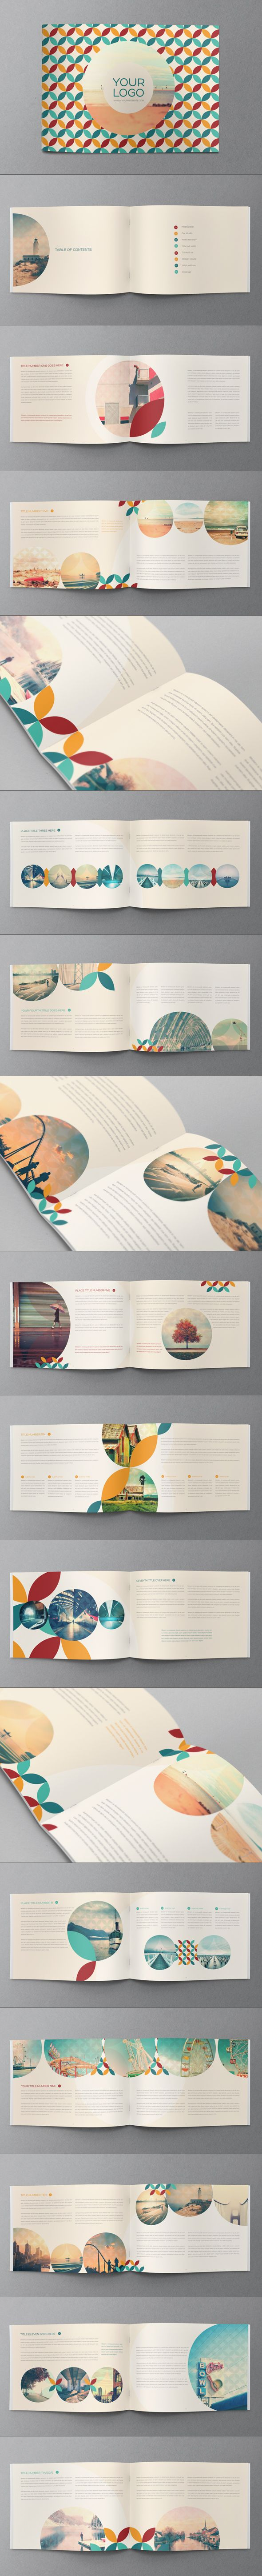 Retro Brochure. Download here: http://graphicriver.net/item/retro-brochure/6726811?ref=abradesign #design #brochure